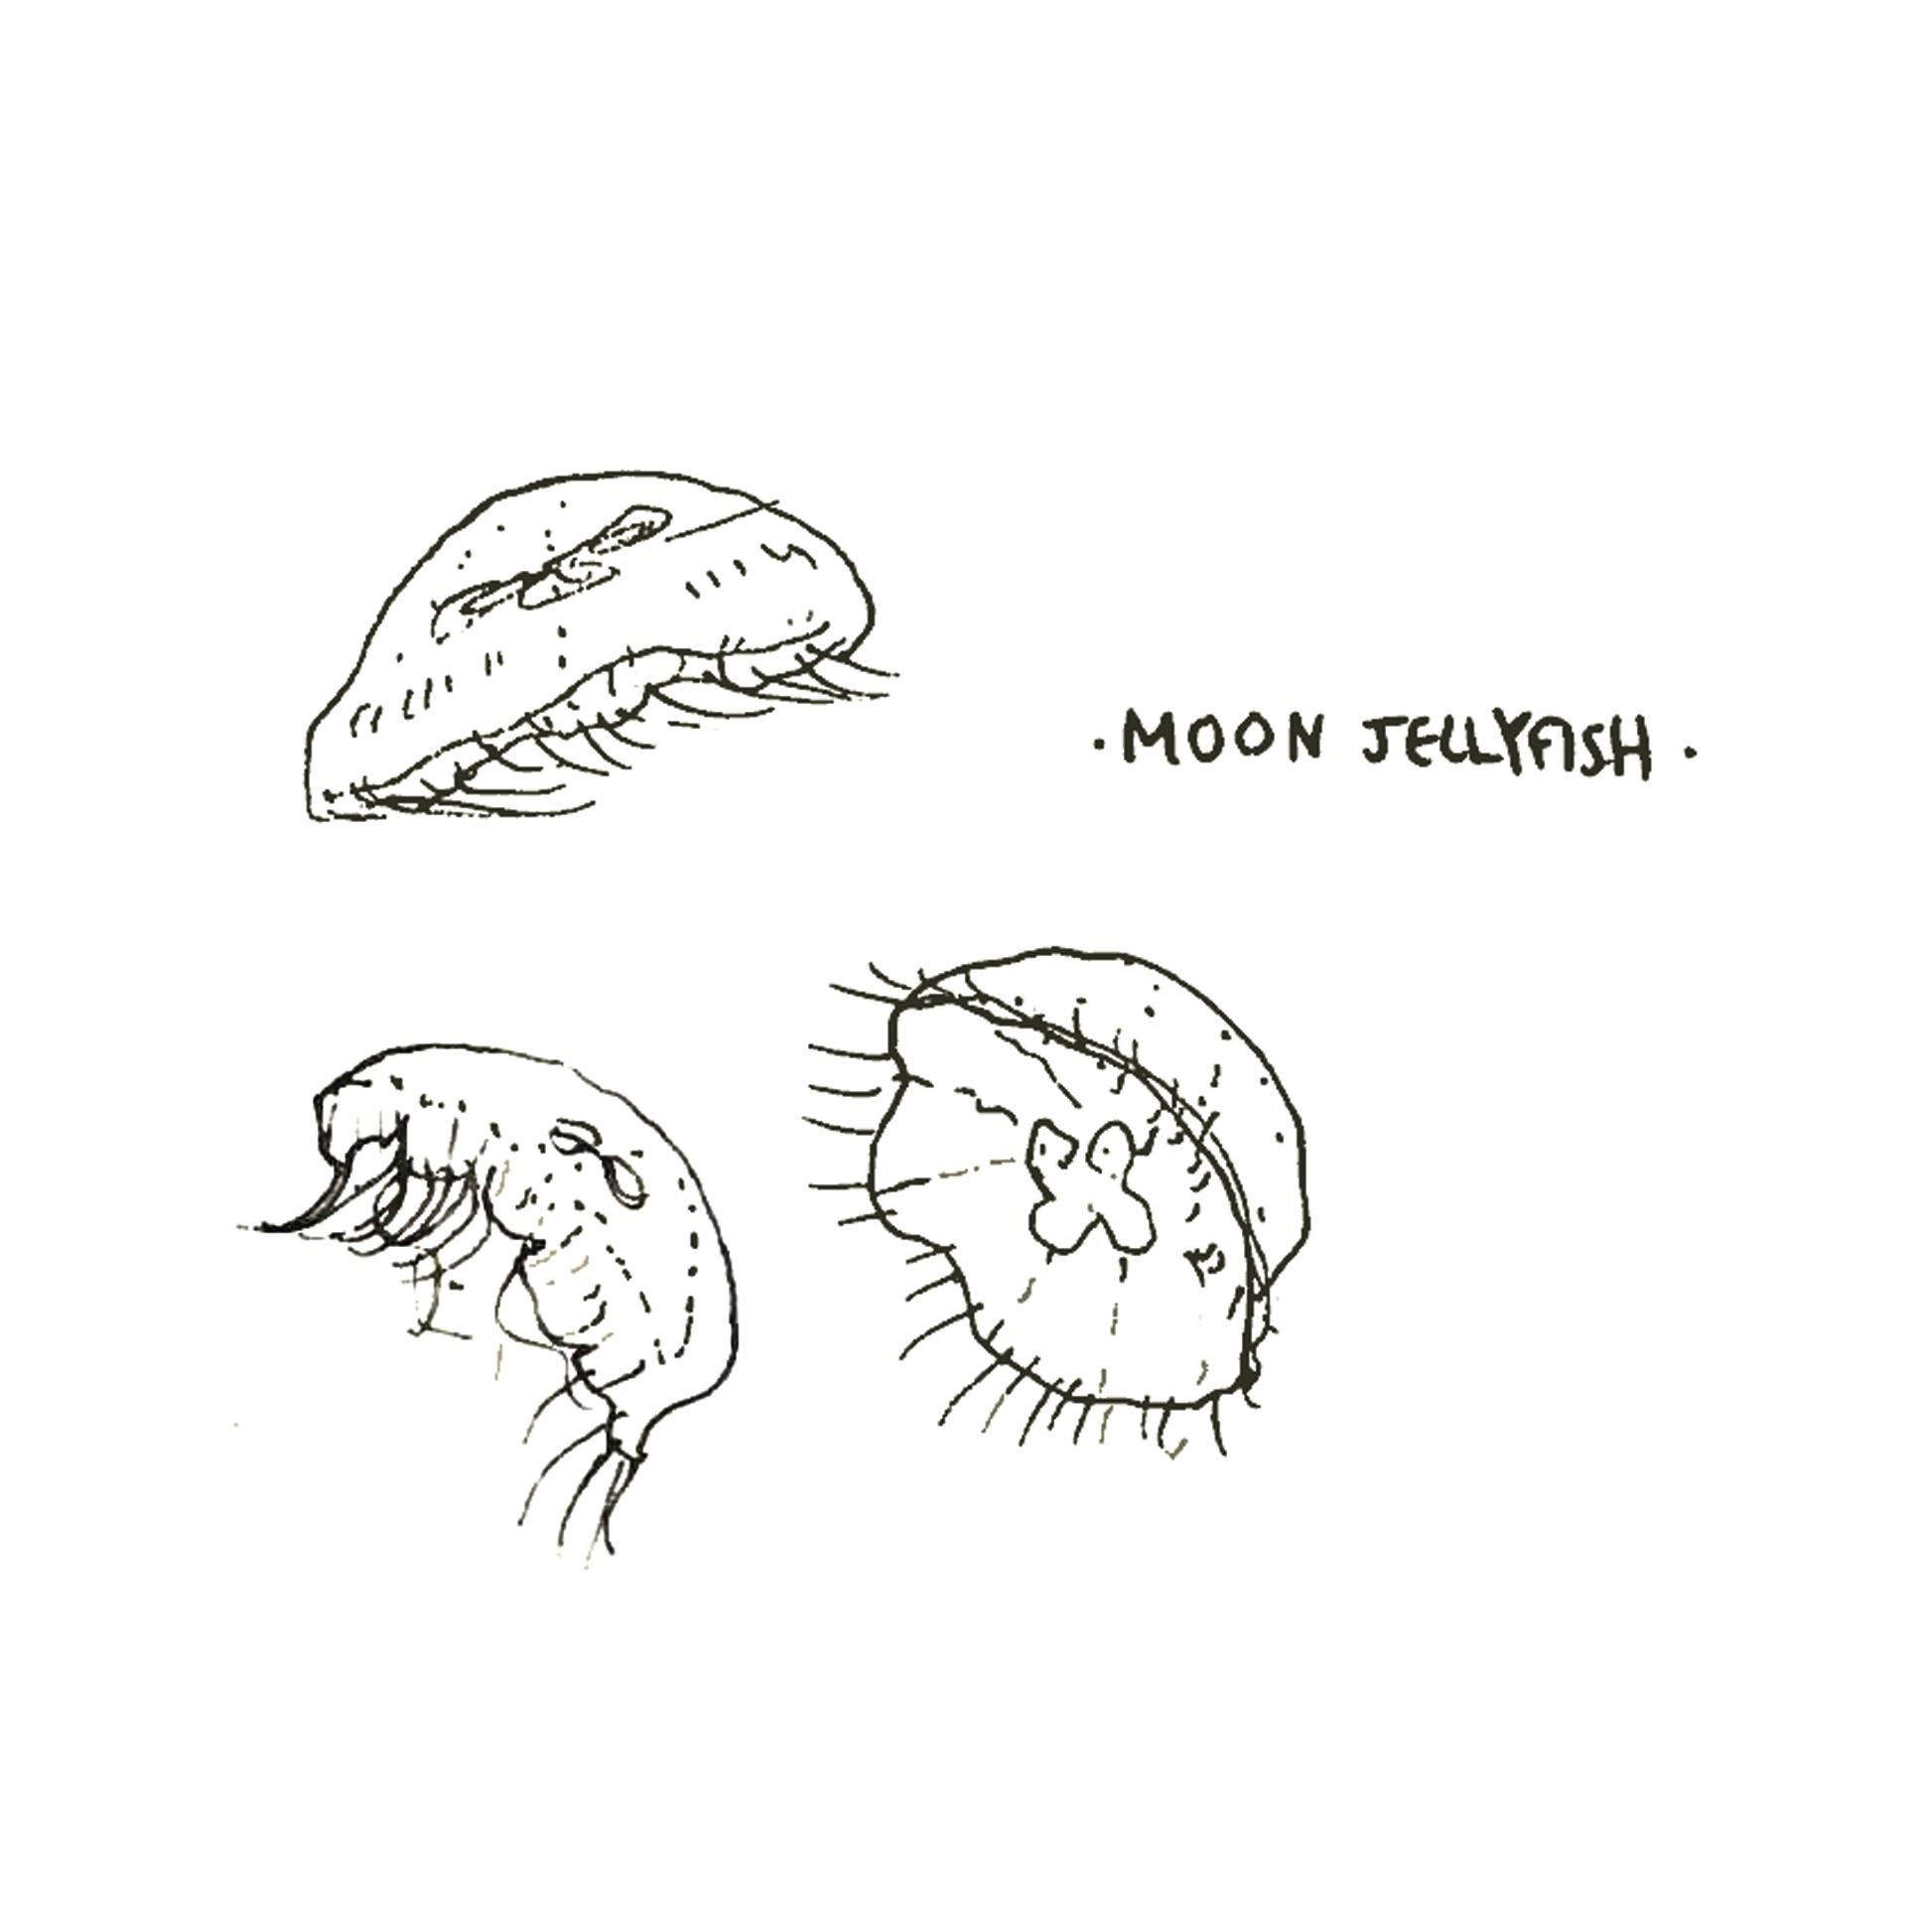 Moonjelly.jpg